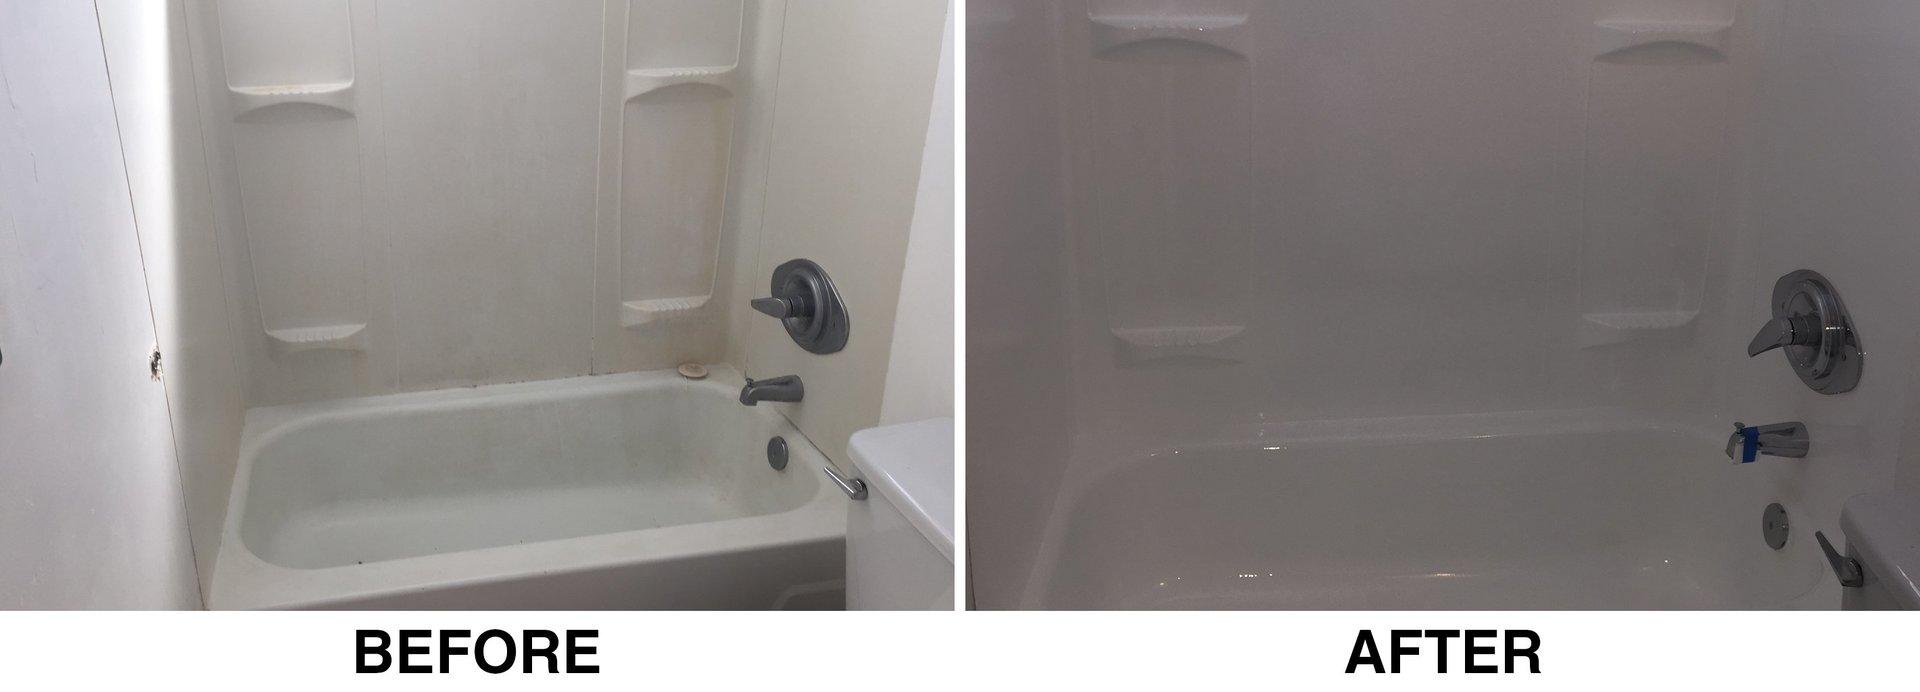 Bathtub & Shower Refinishing Co. of Hawaii image 9